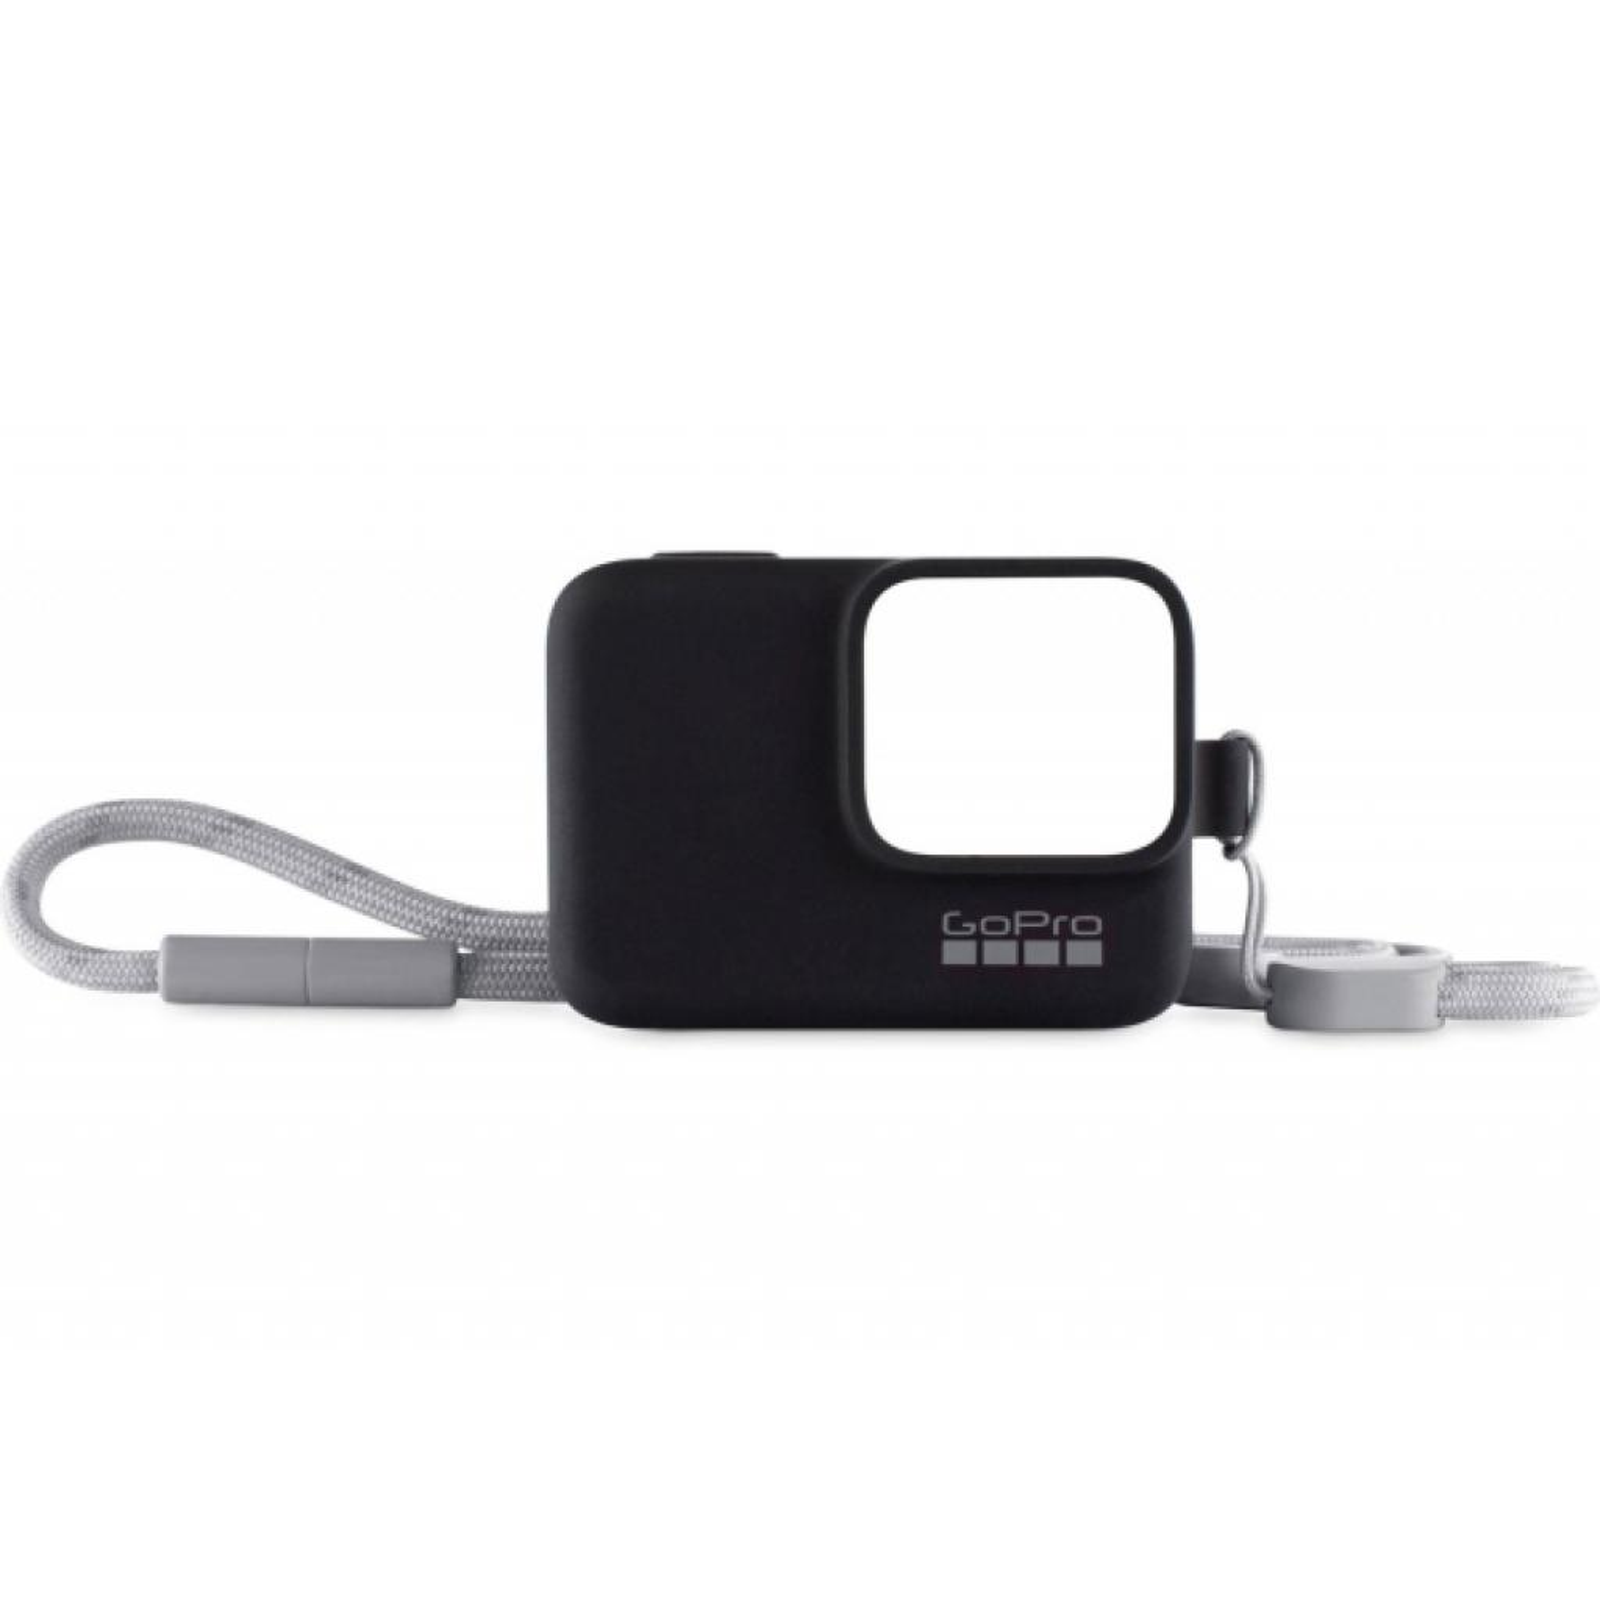 Аксессуар к экшн-камерам GoPro Sleeve & Lanyard (Black) (ACSST-001)